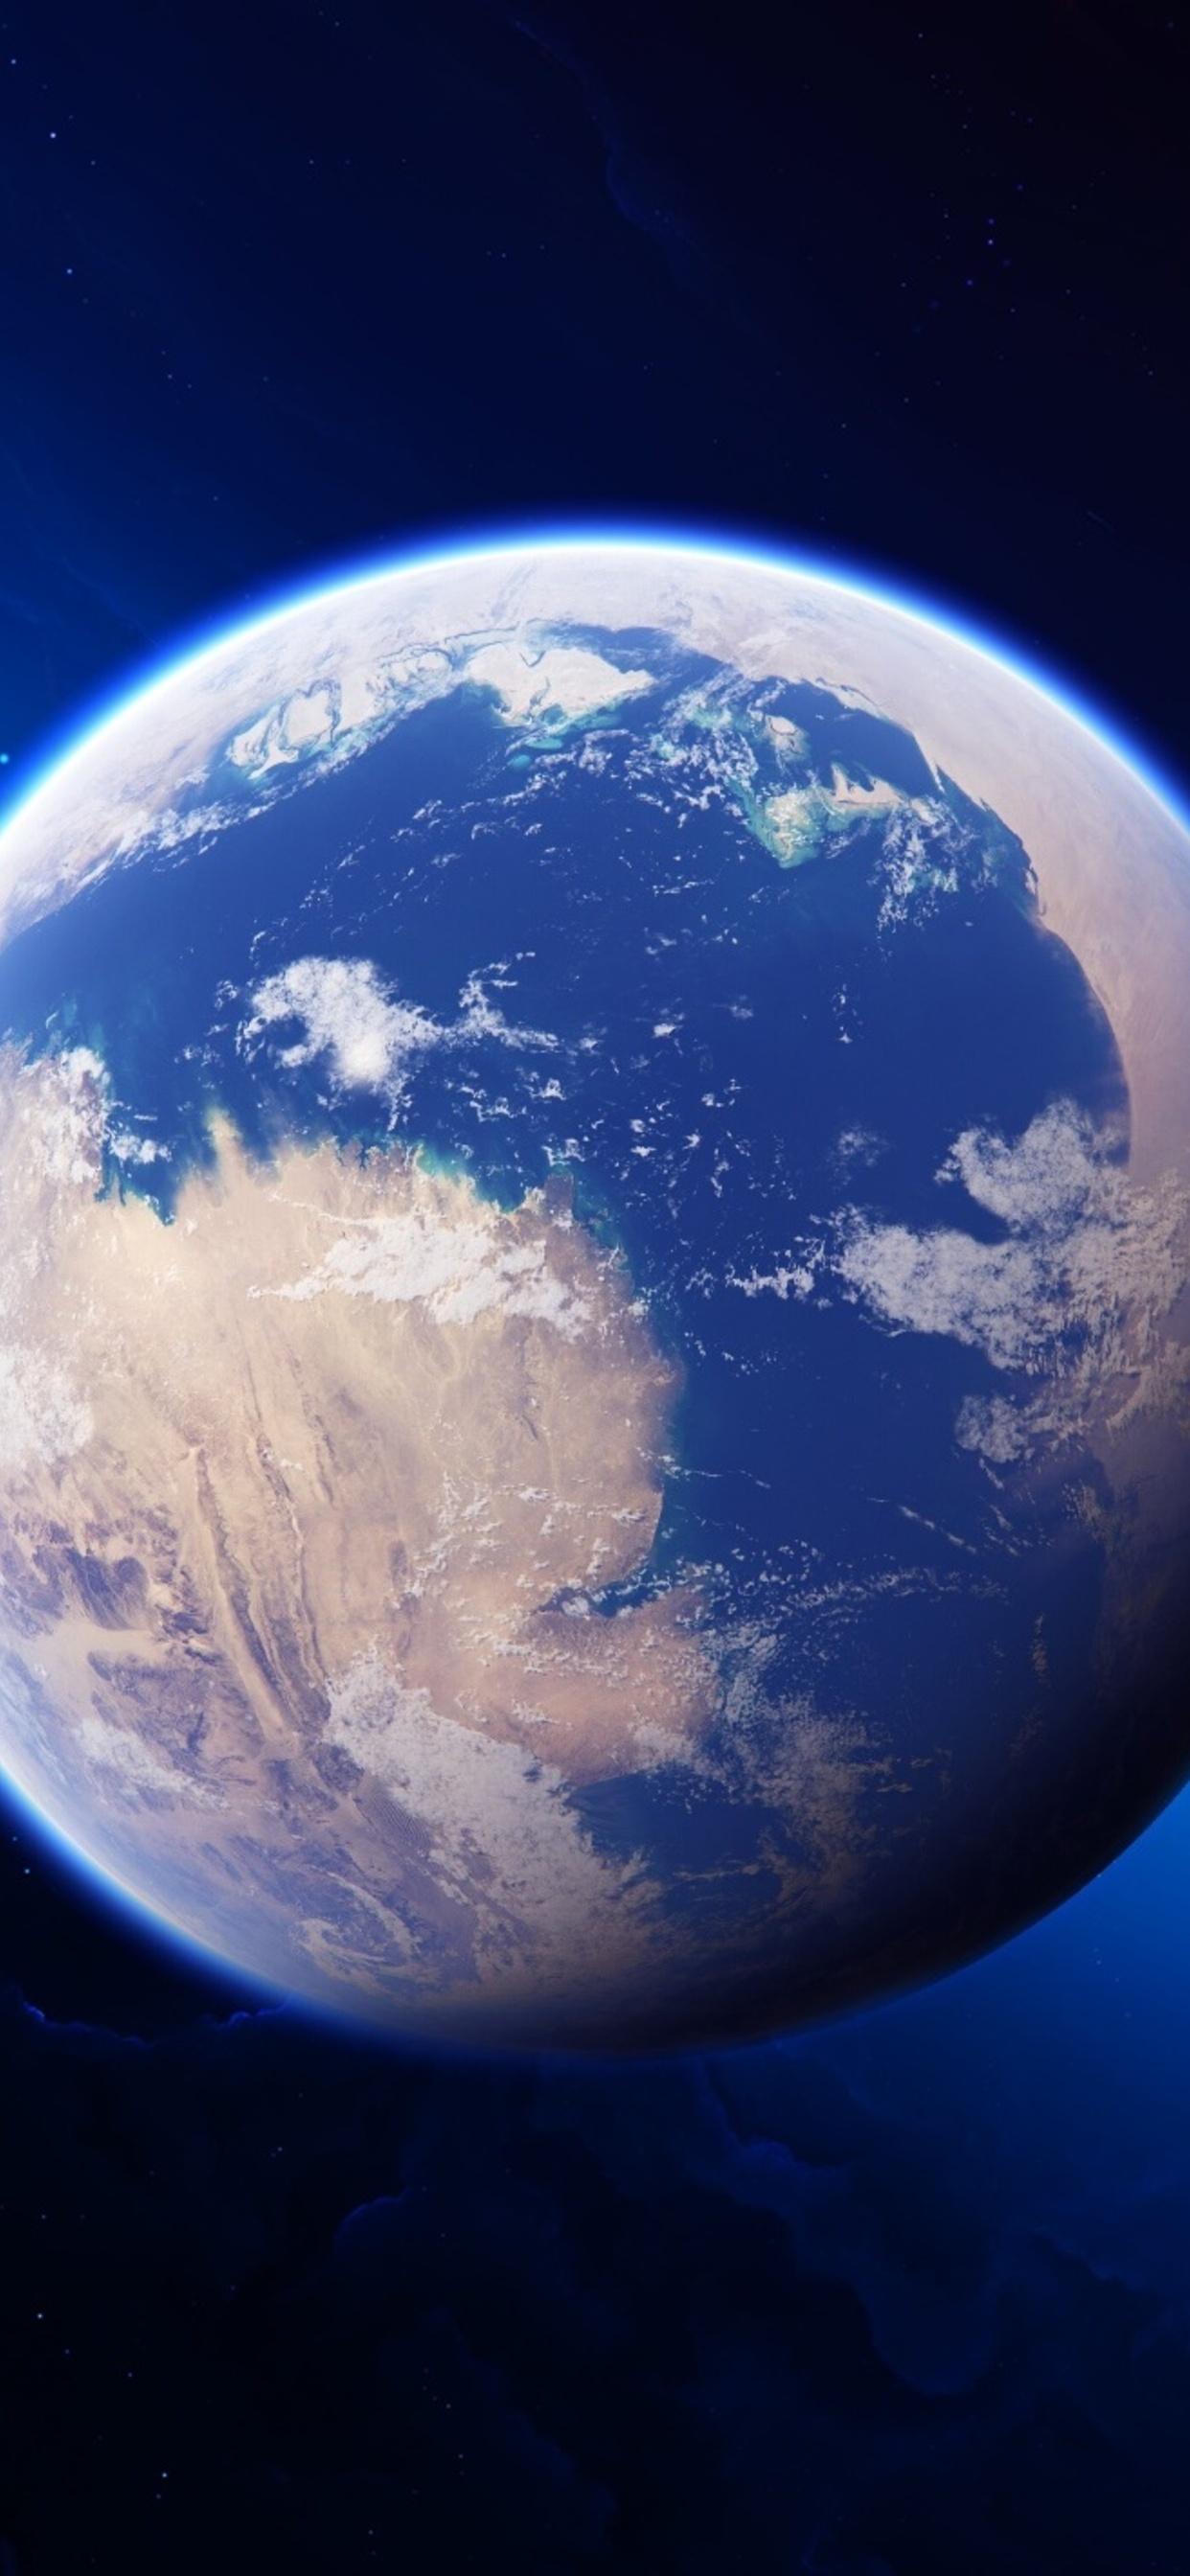 Iphone Wallpaper 4k Earth